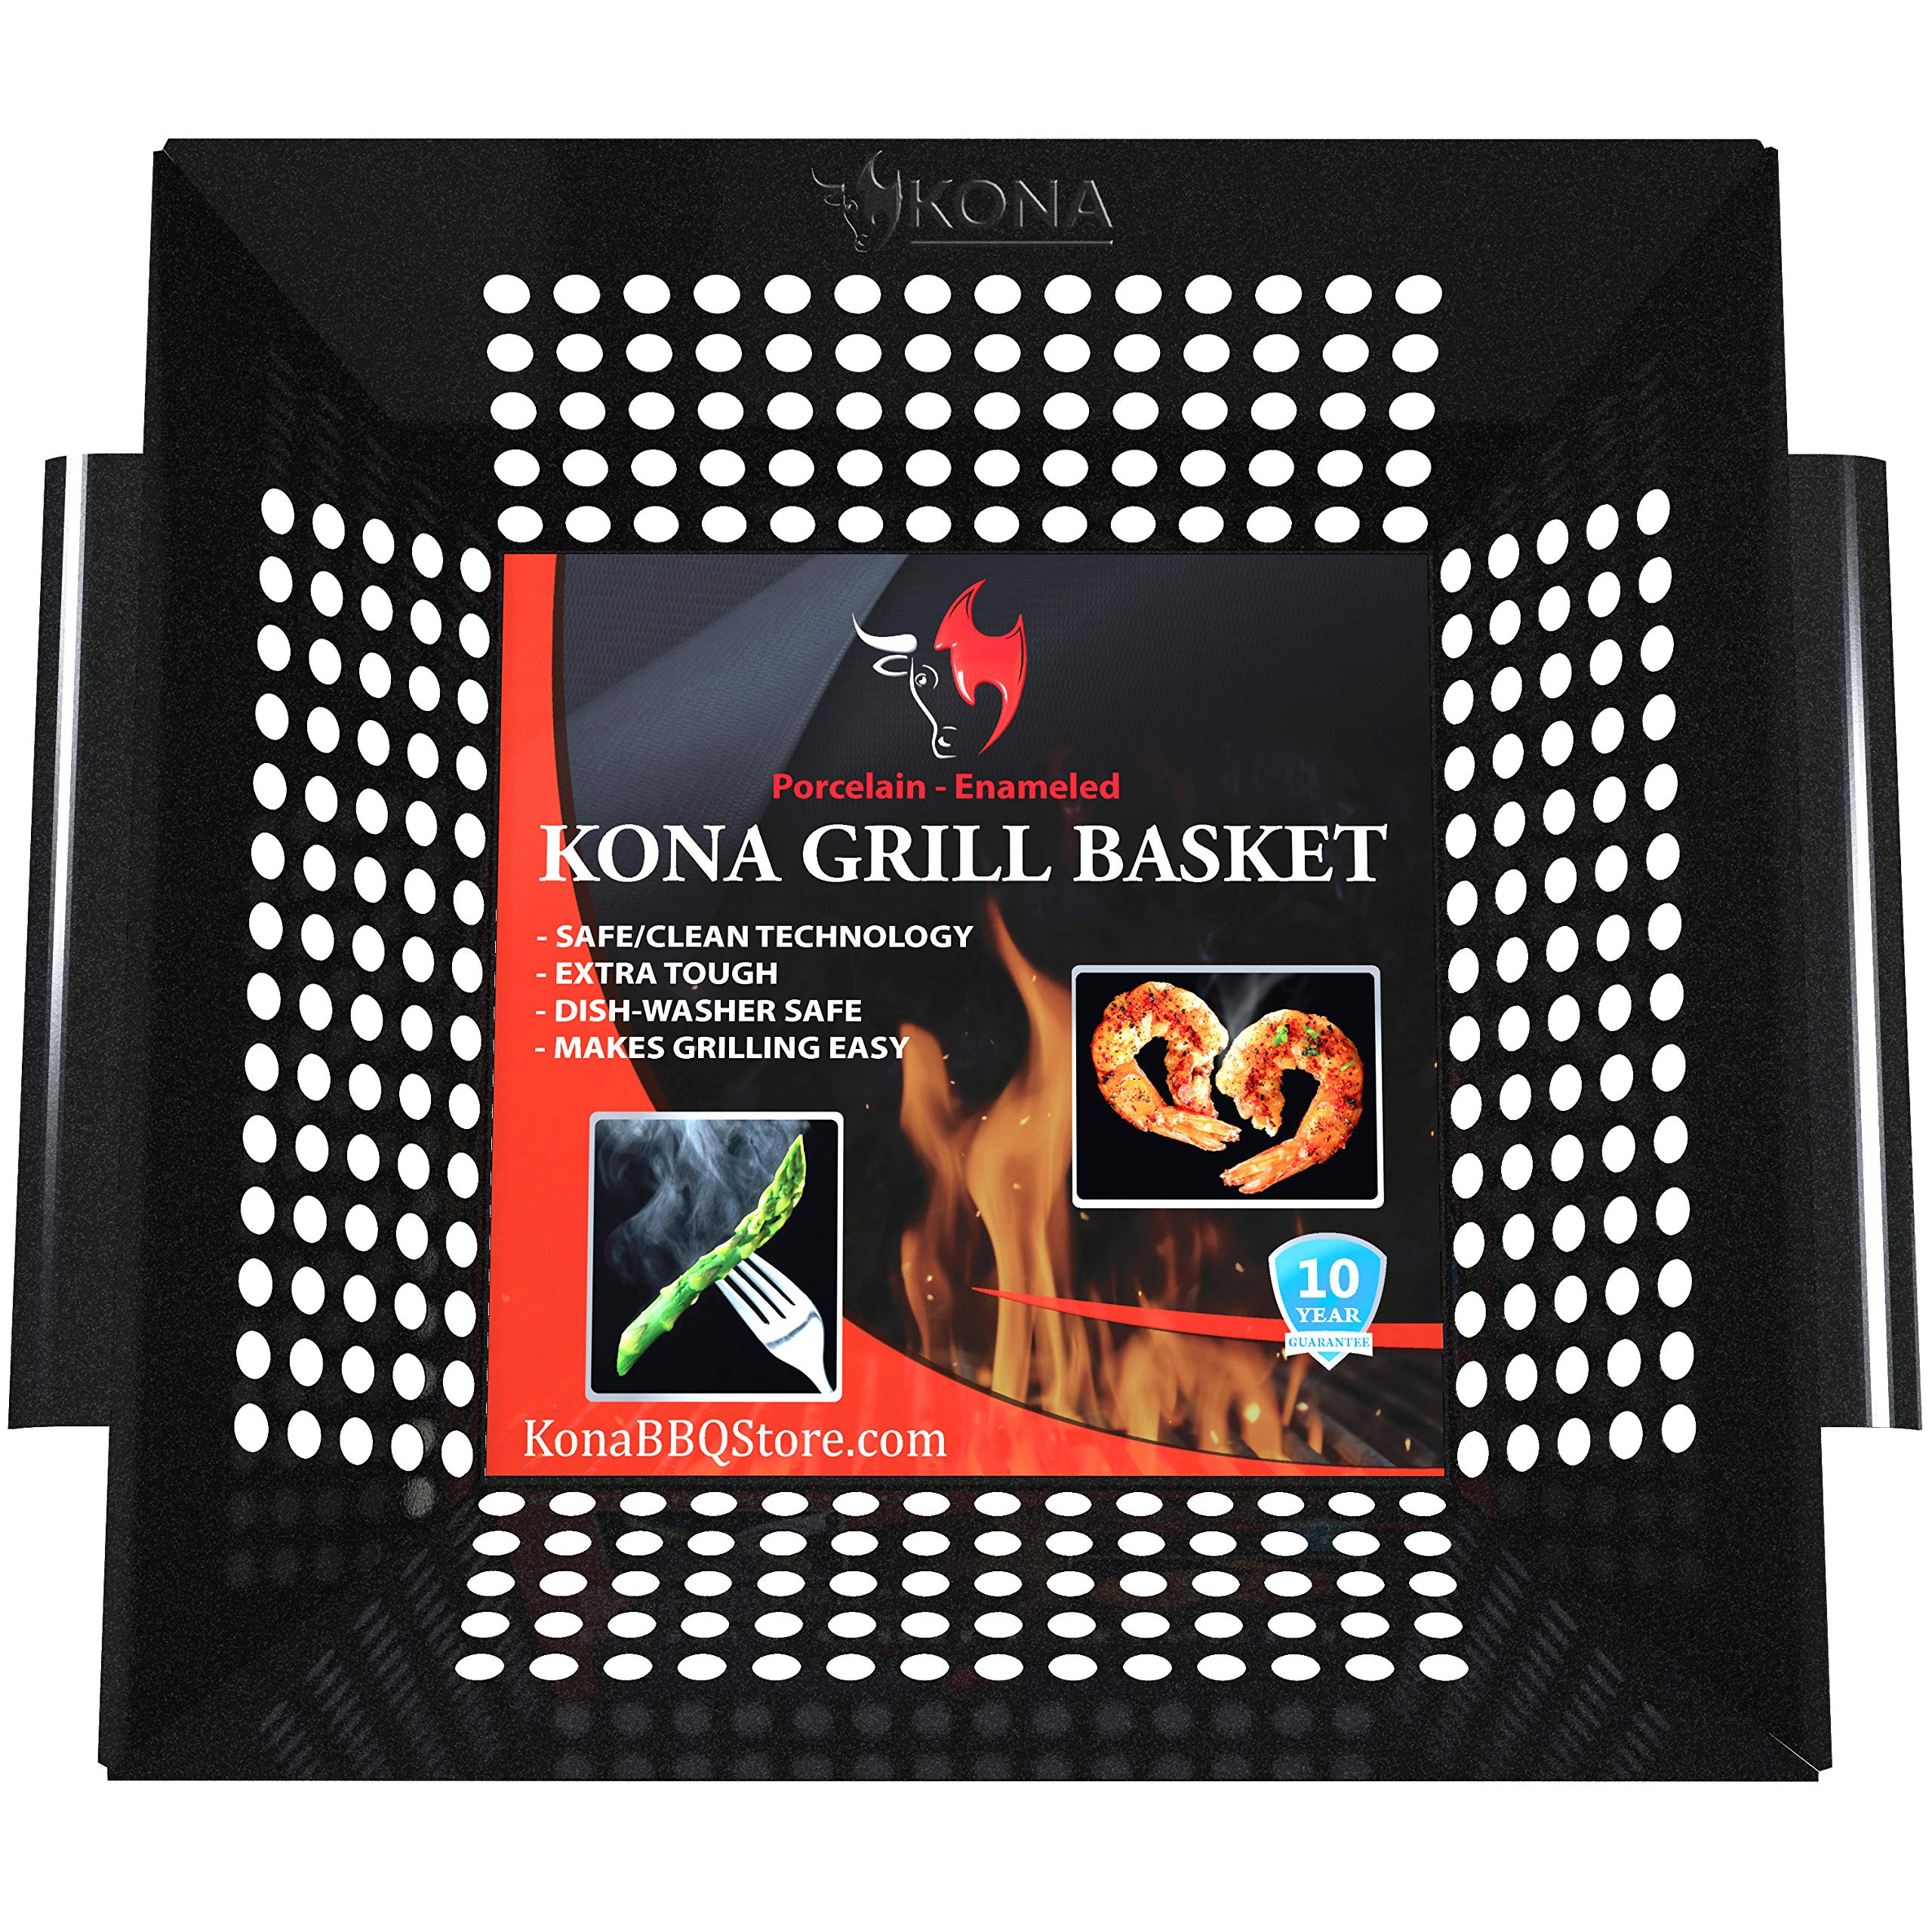 Kona Best Vegetable Grill Basket - Safe/Clean Porcelain Enameled BBQ Grilling Basket (Large 12x12x3 inches) for Veggies, Kabobs, Seafood, Meats by Kona